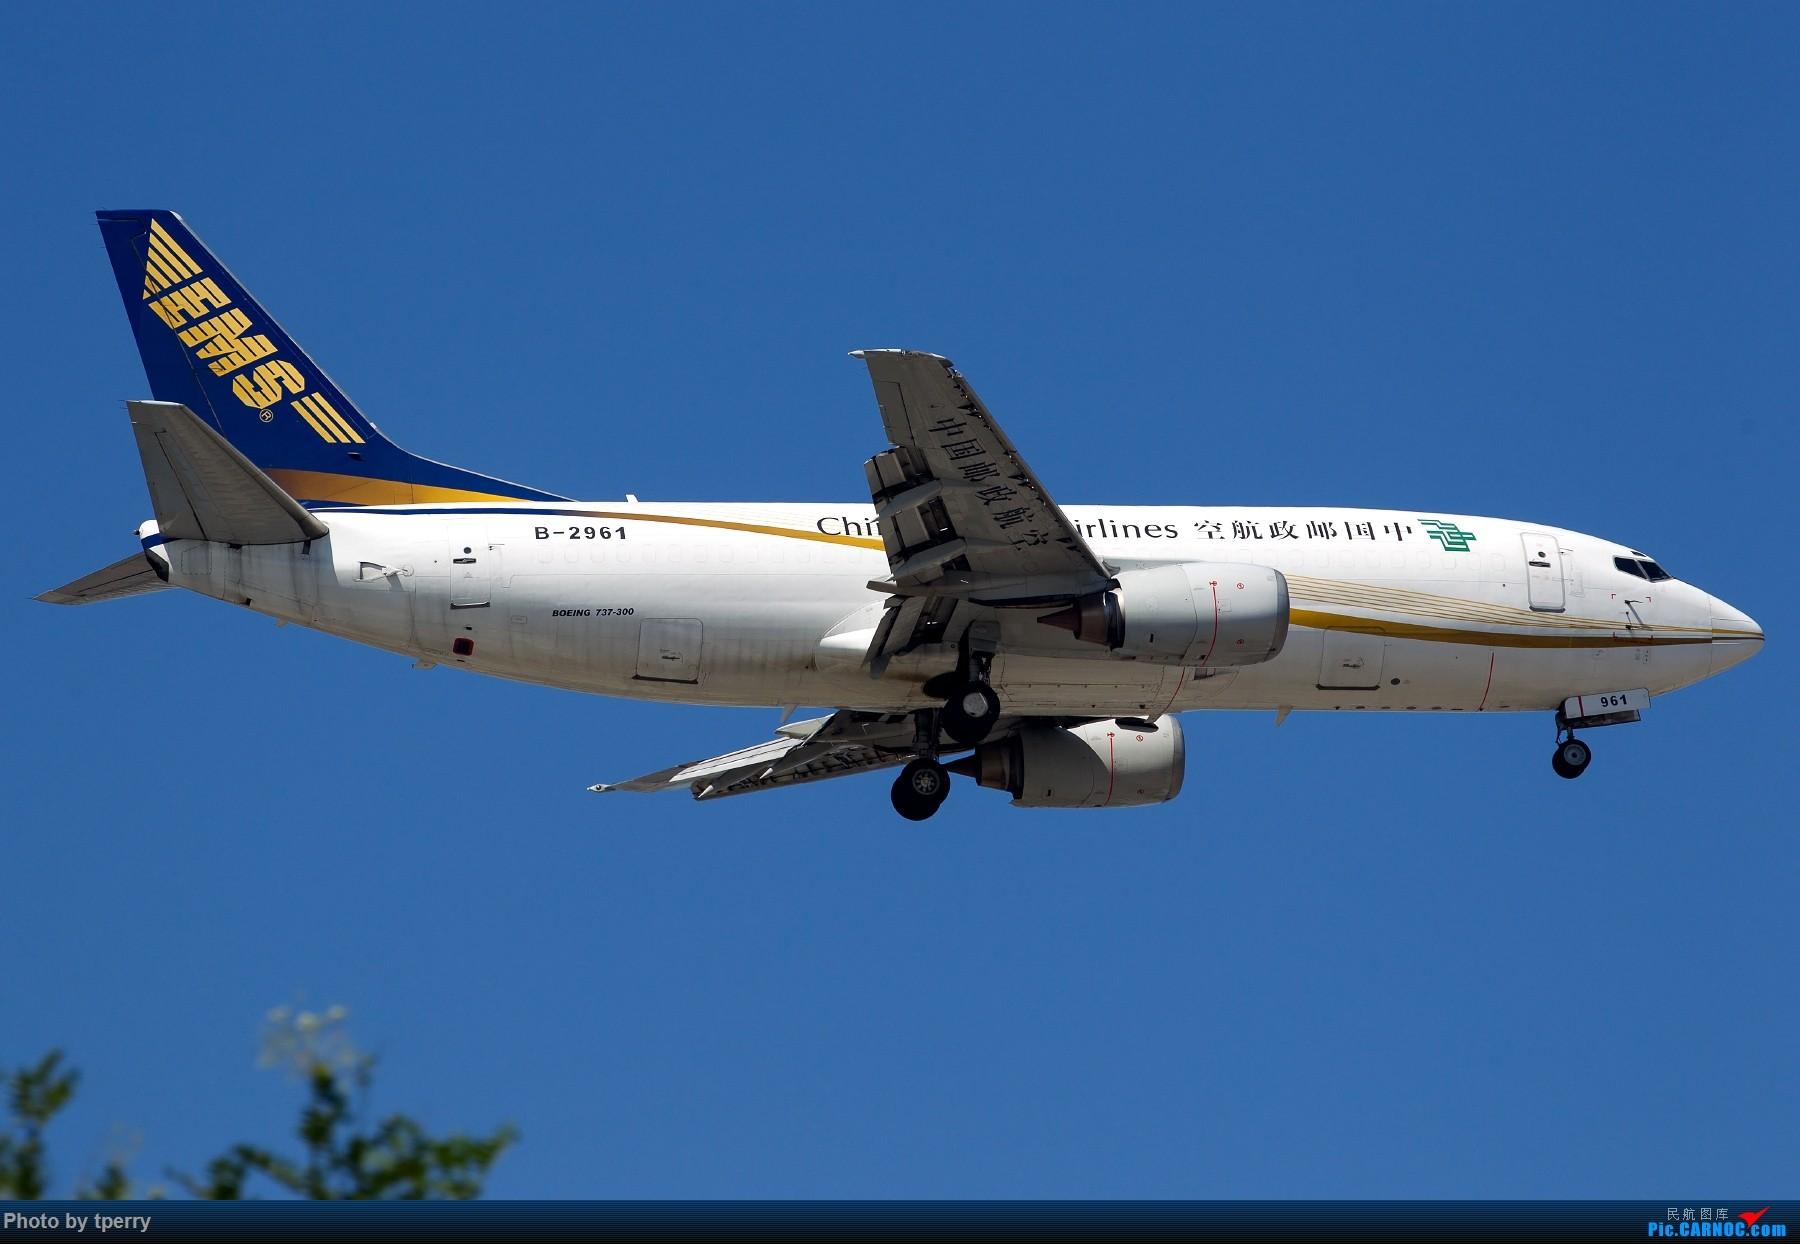 Re:[原创]【1800大图】蓝天来好货的机会可真不多 关键词:汉莎拜仁 米老鼠 达美天合 BOEING 737-300 B-2961 中国北京首都国际机场